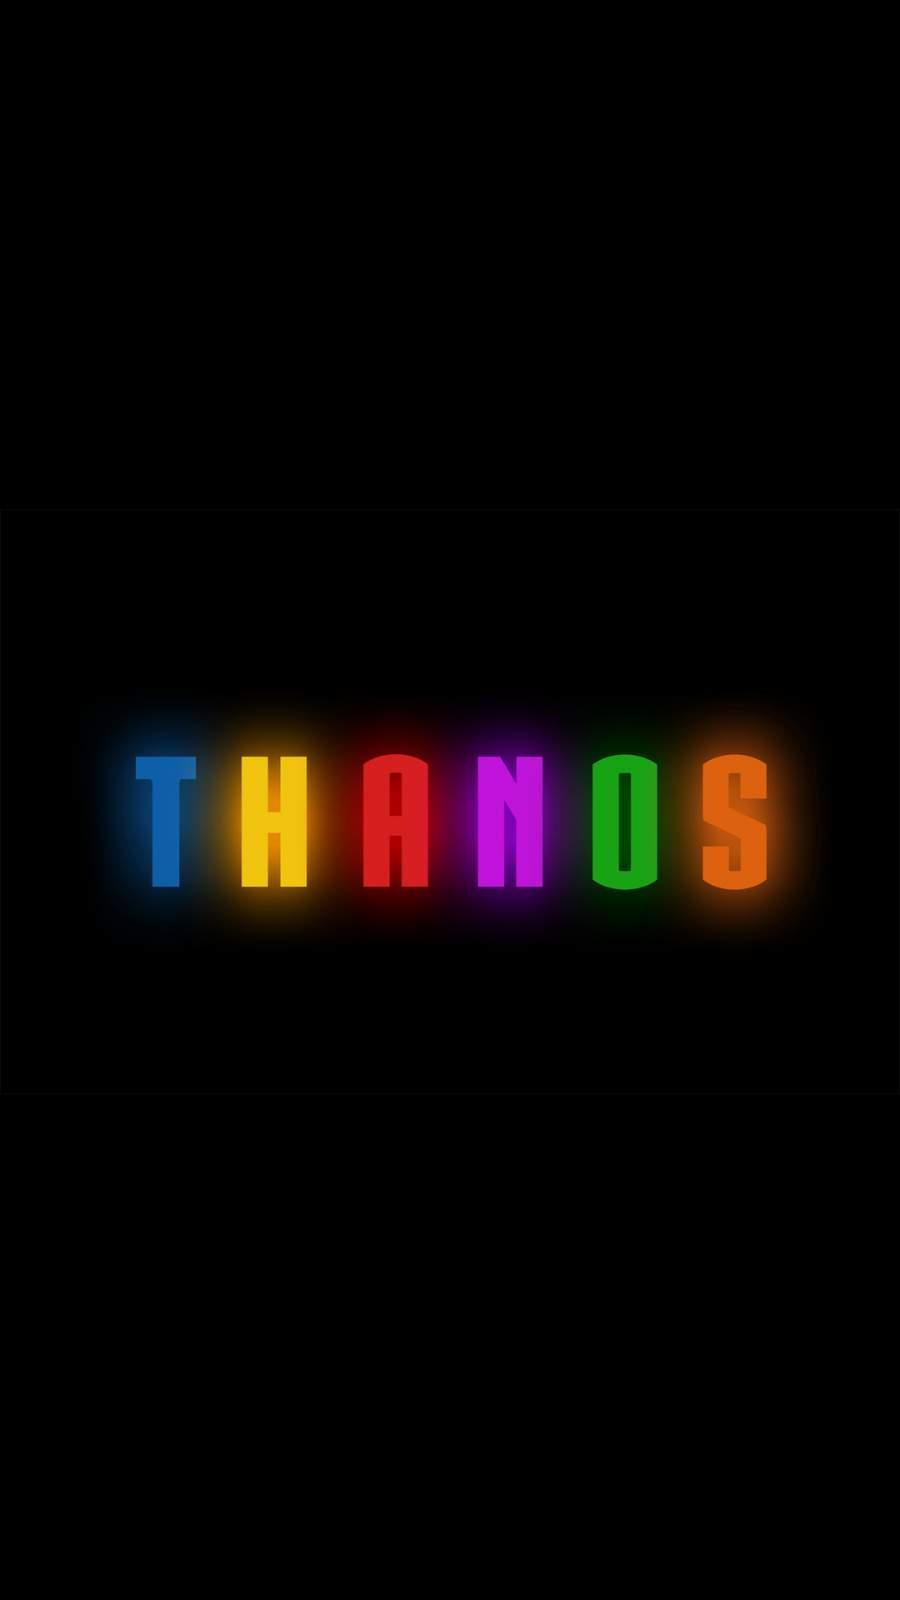 Thanos Logo Artwork iPhone Wallpaper